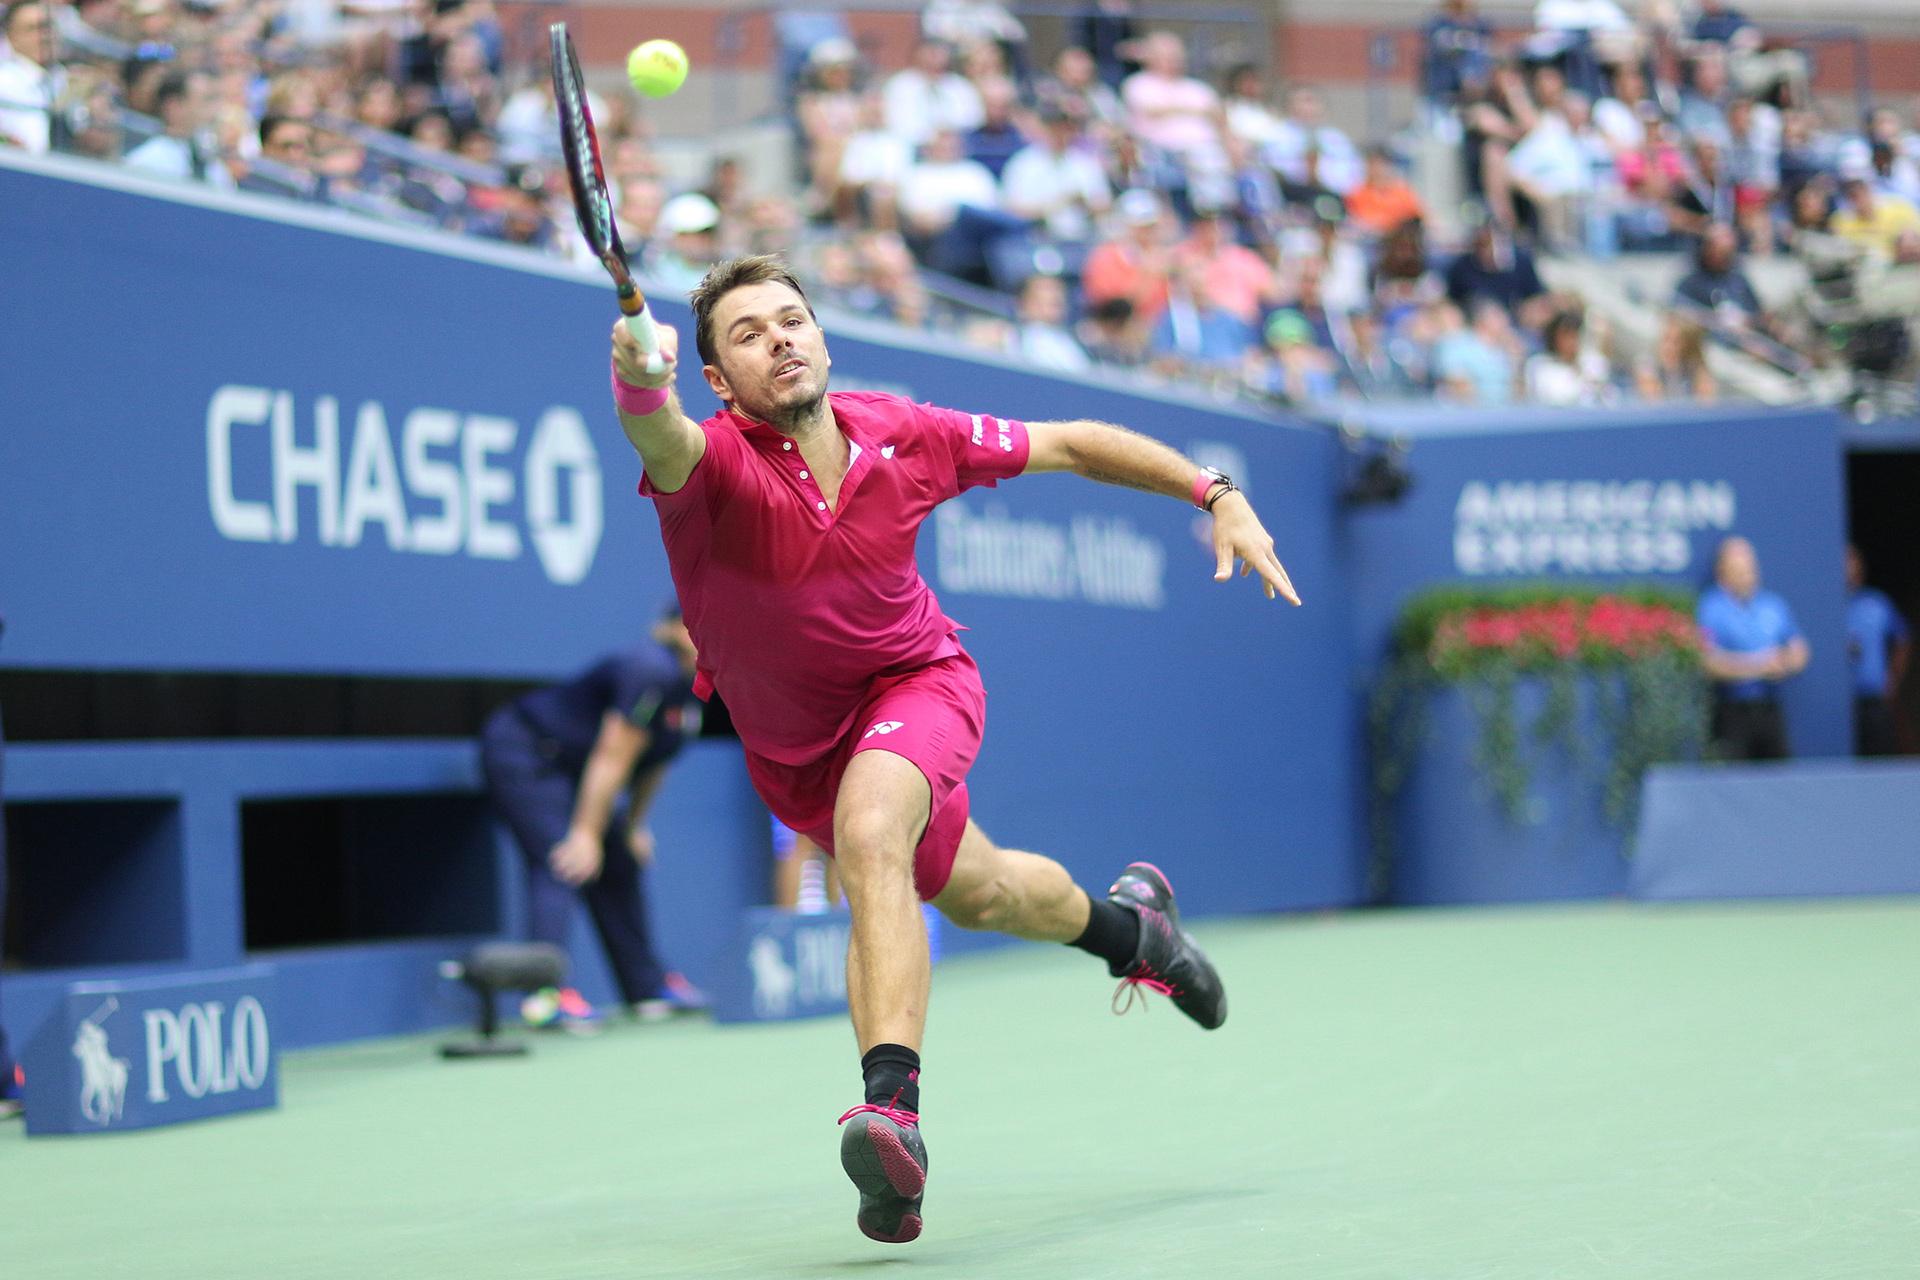 110916_Tennis_USOpen_3185